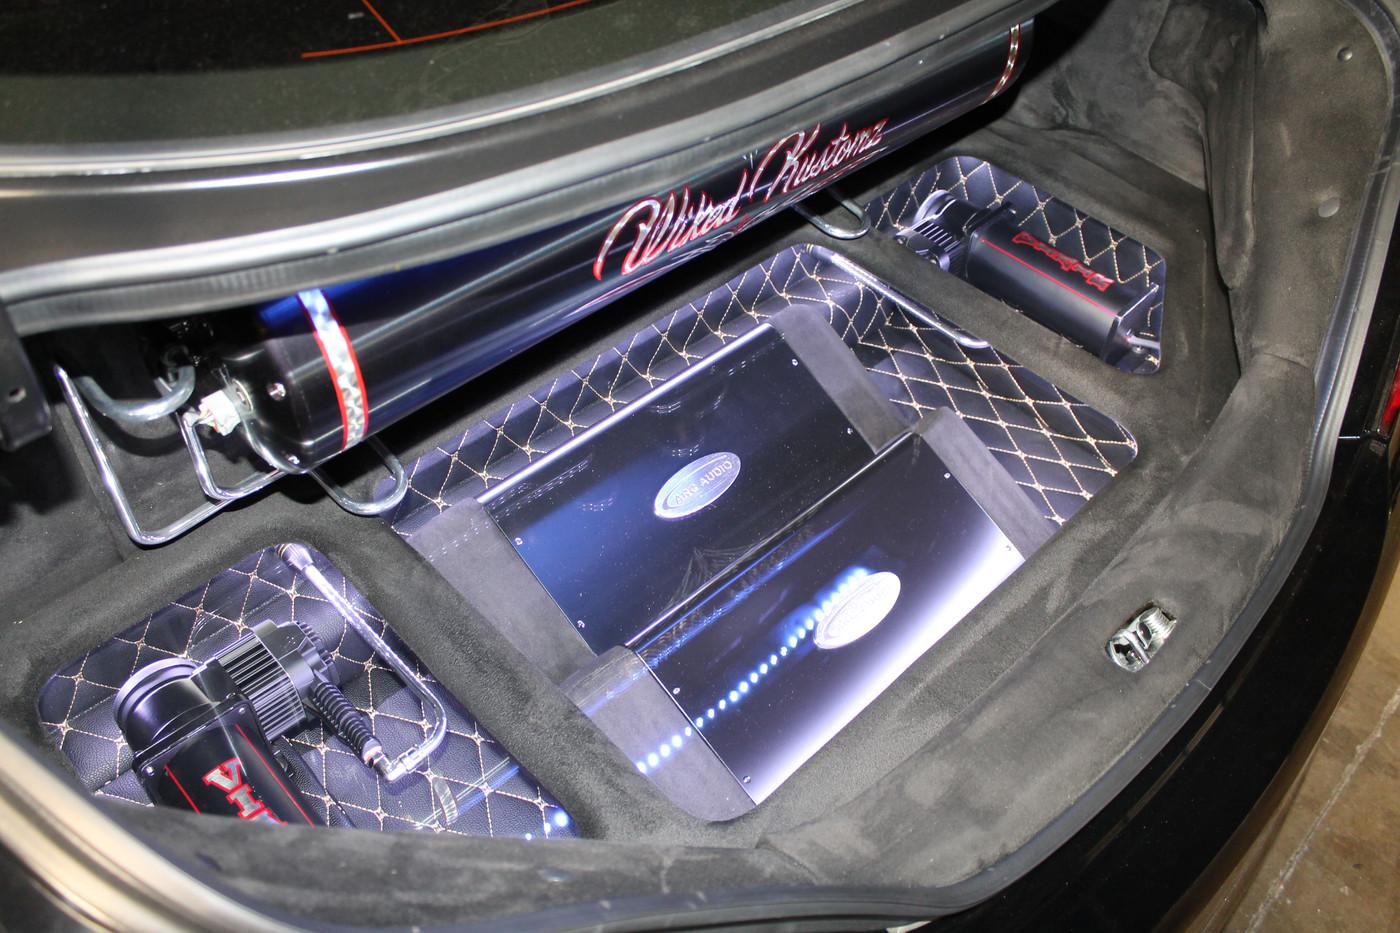 2016 Hyundai Genesis (47).JPG